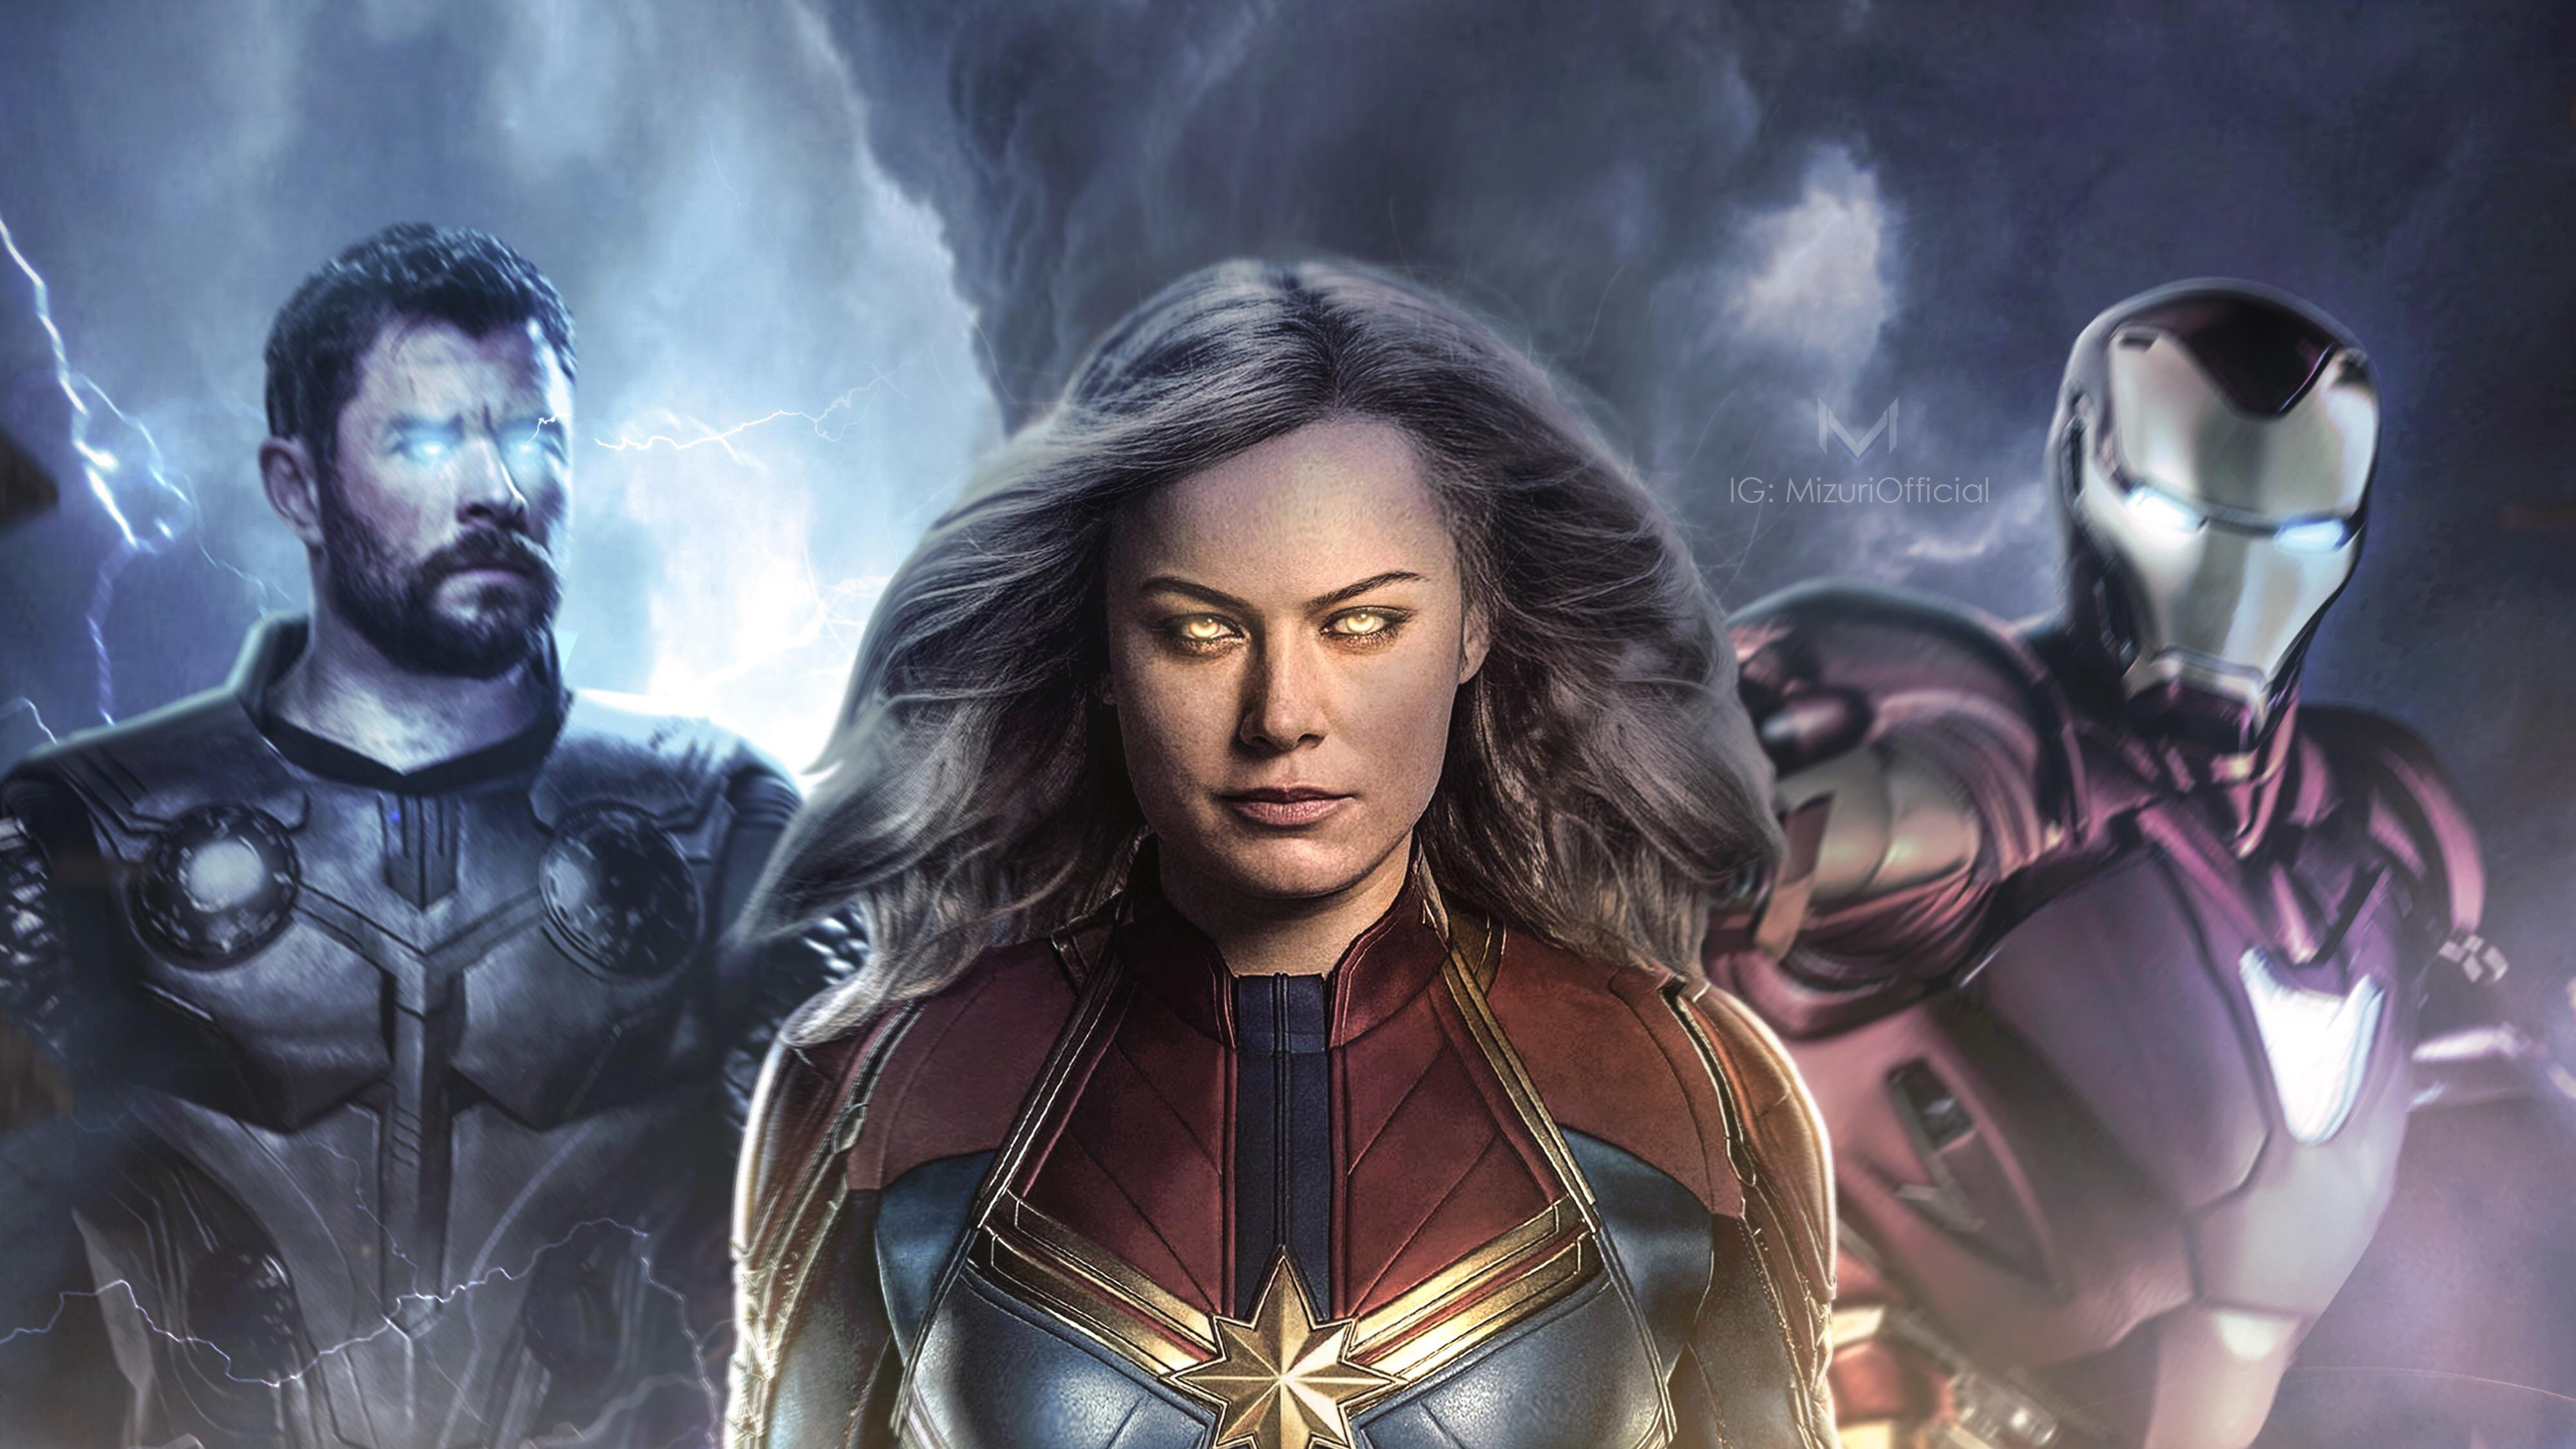 Avengers Endgame 4k Ultra Fond D écran Hd Arrière Plan